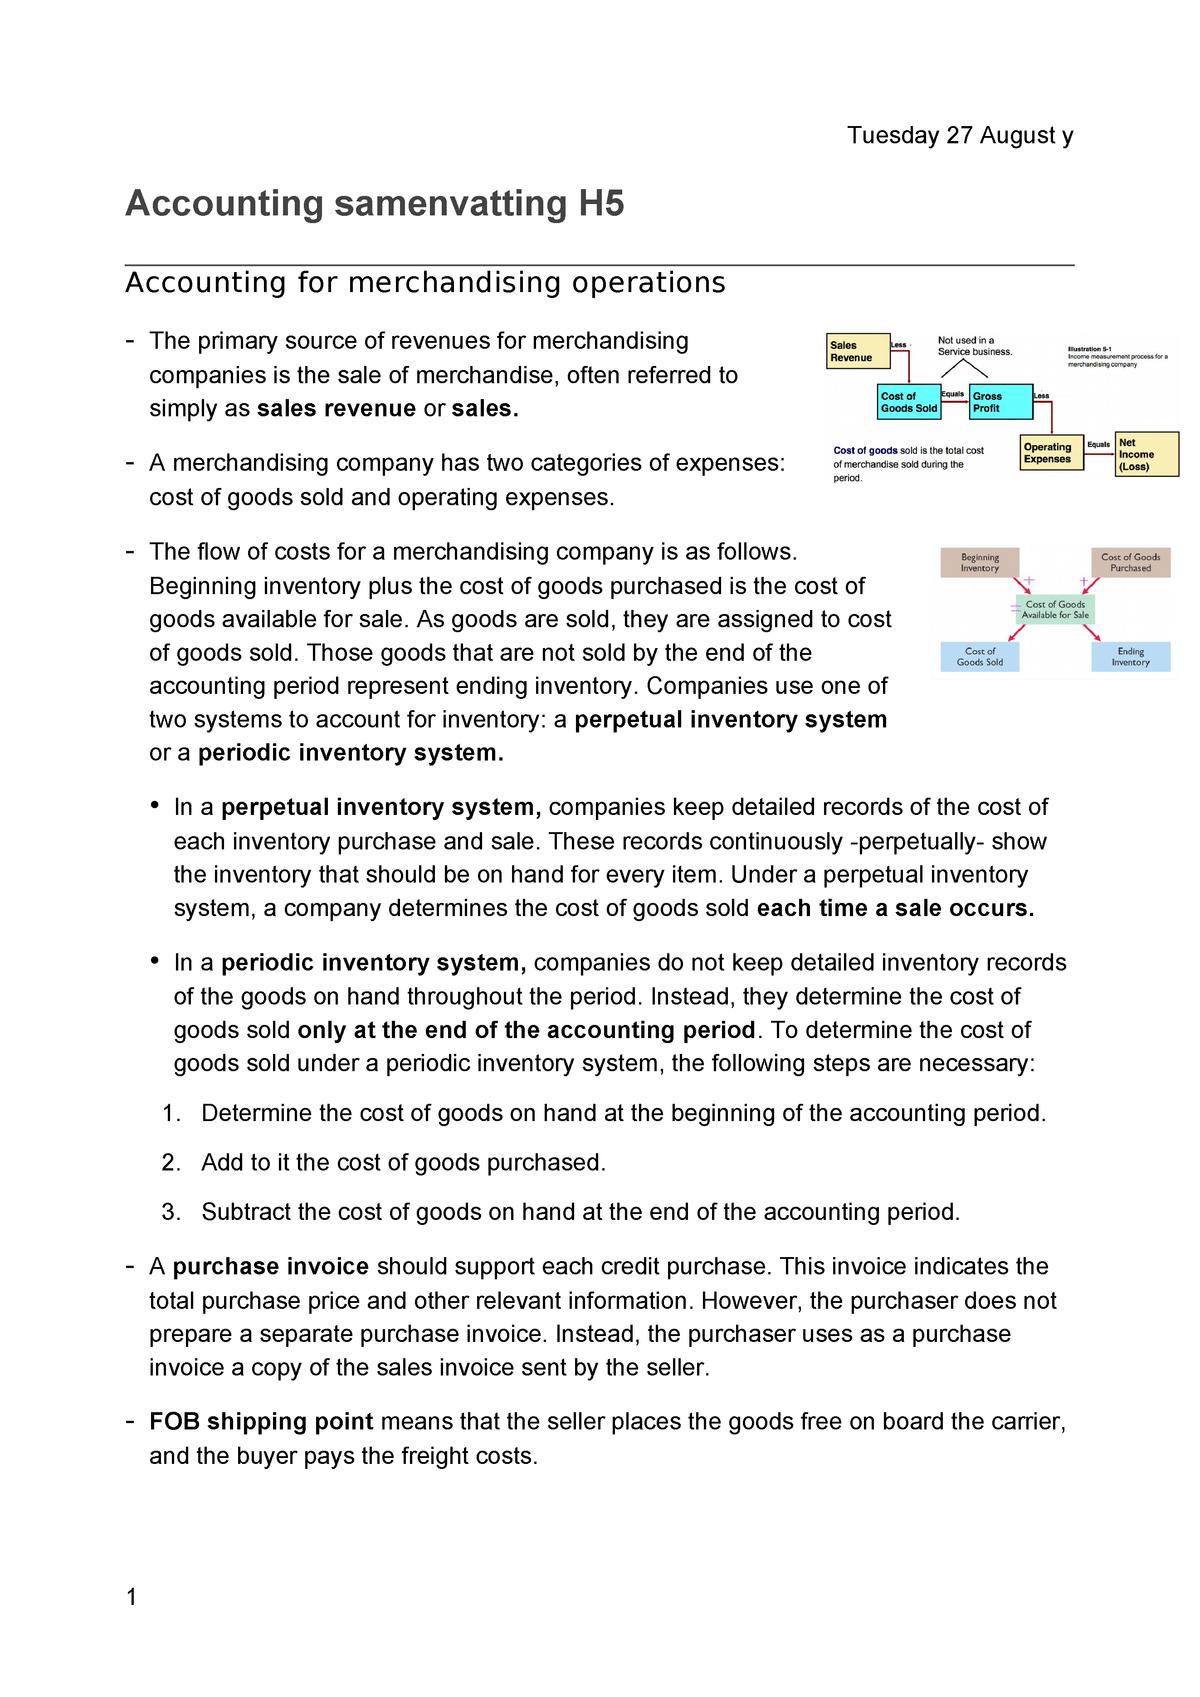 Accounting samenvatting H5 - FEB11018 - StudeerSnel nl